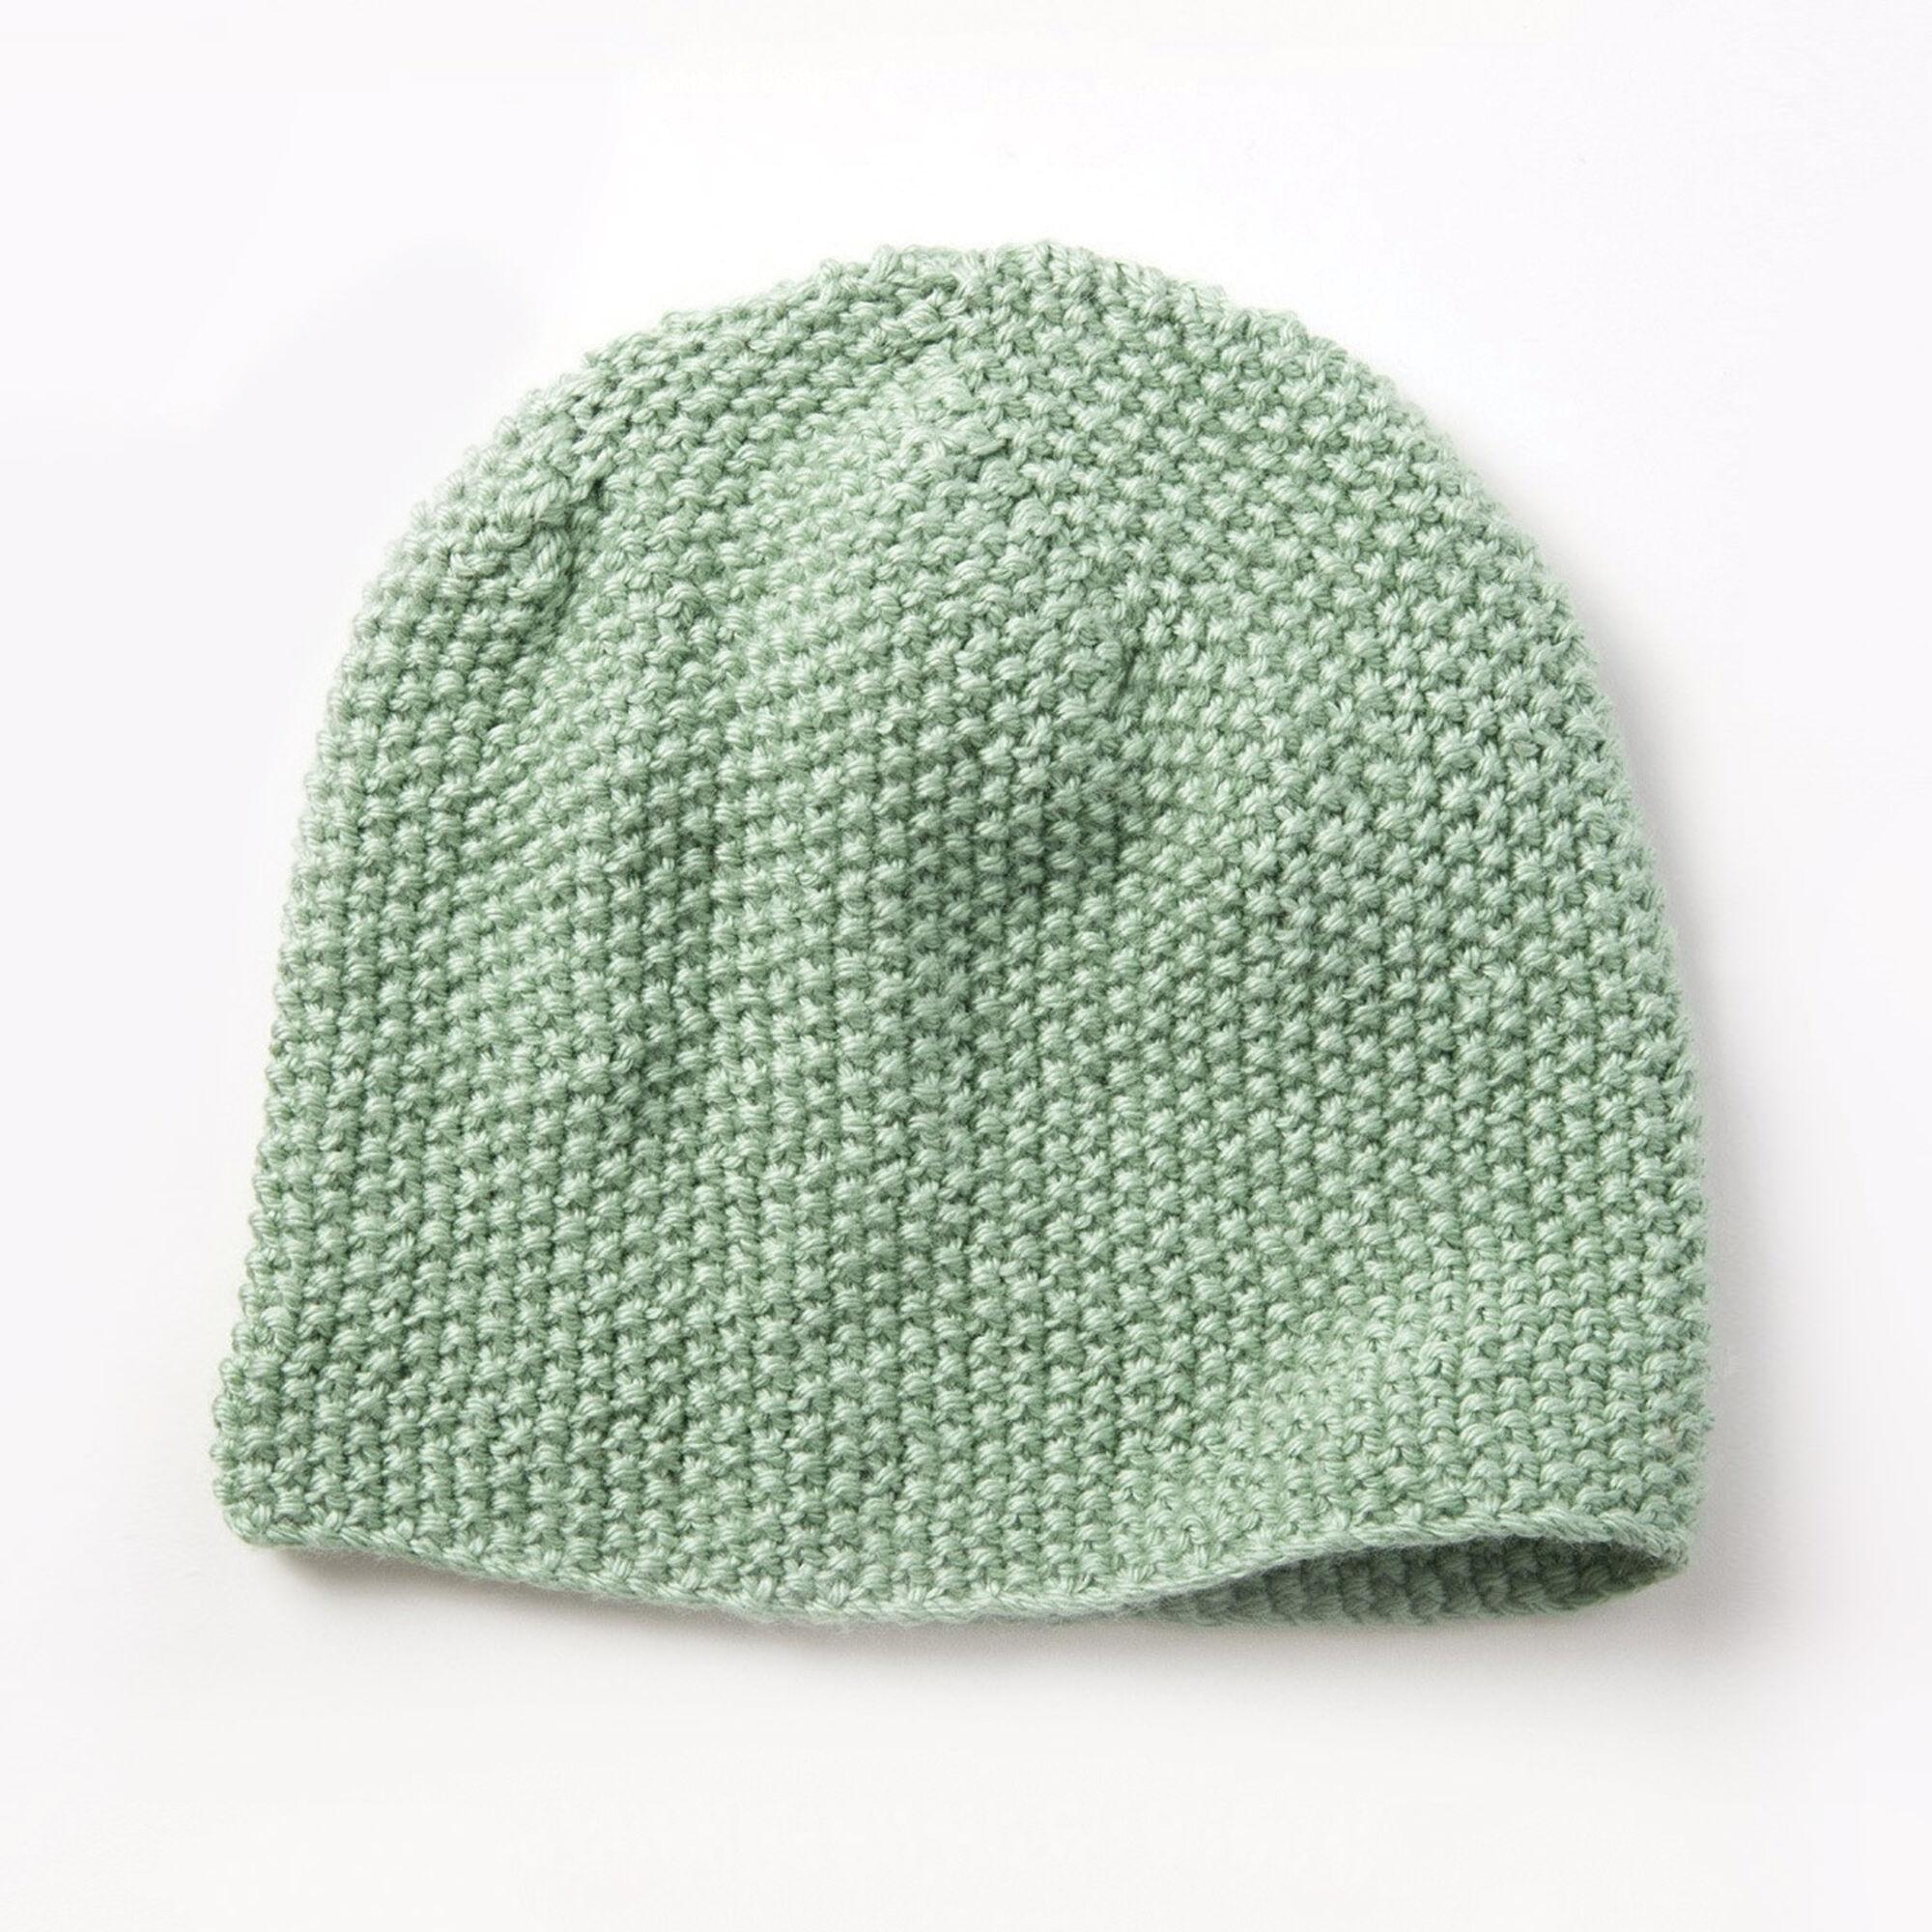 caron seed stitch beanie yarnspirations